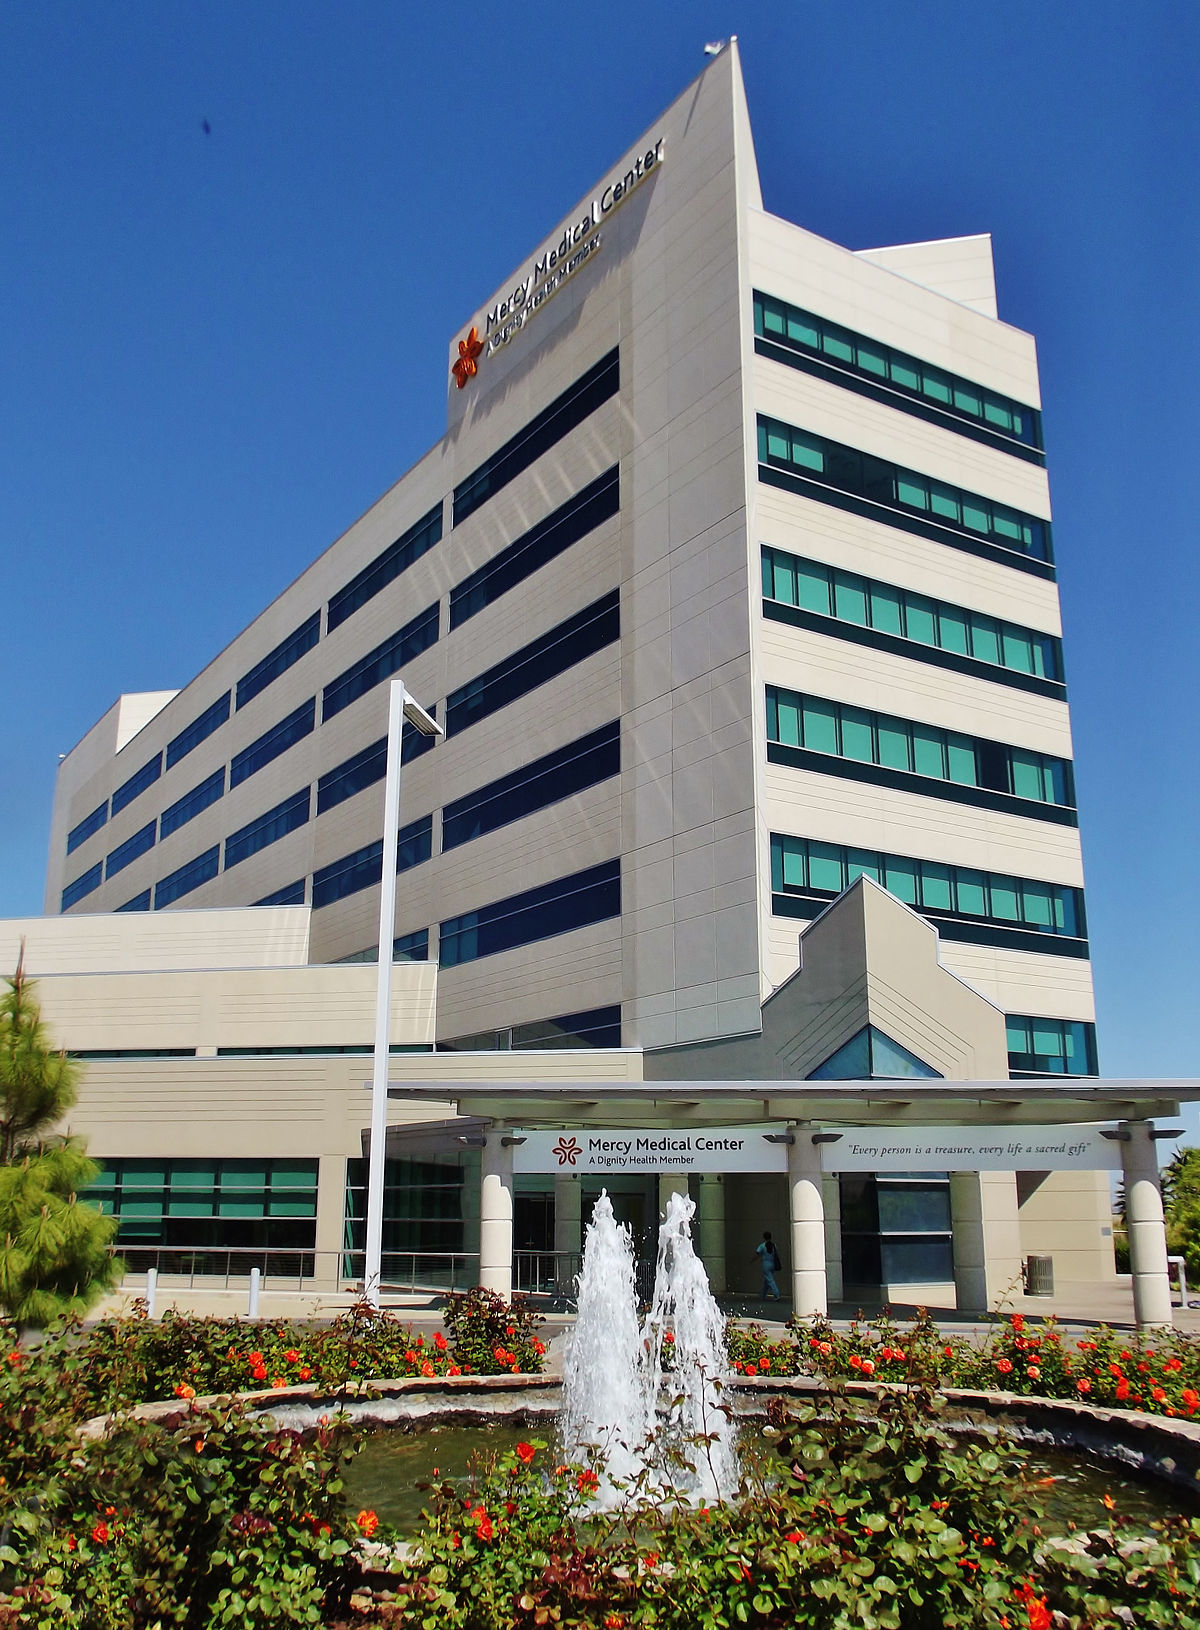 Mercy Medical Center Merced - Wikipedia